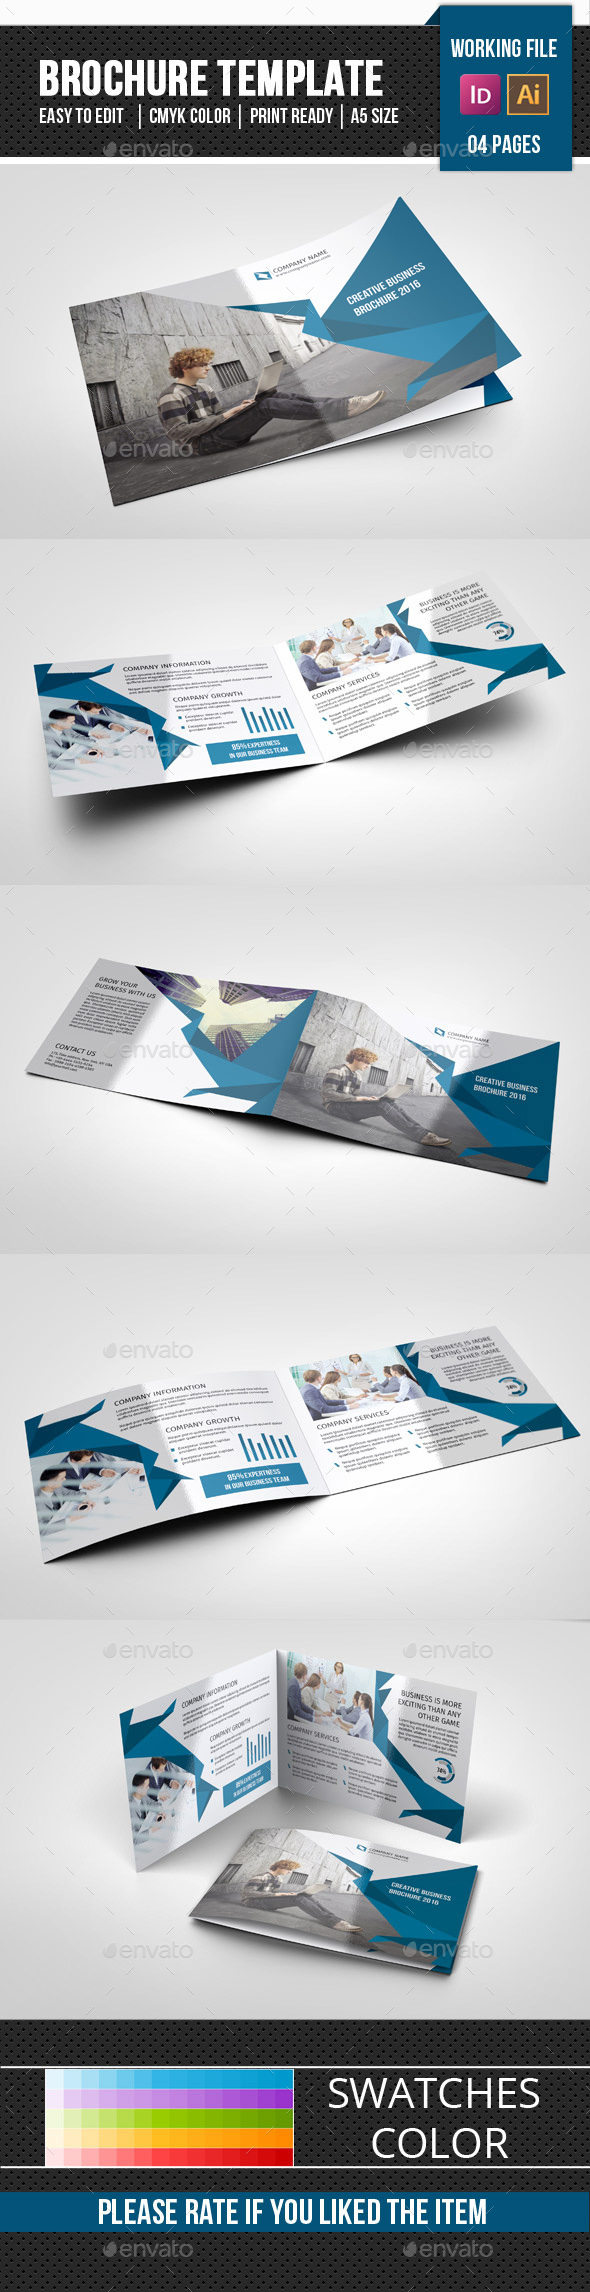 Corporate Brochure | 4 Pages Landscape Template - Corporate Brochures